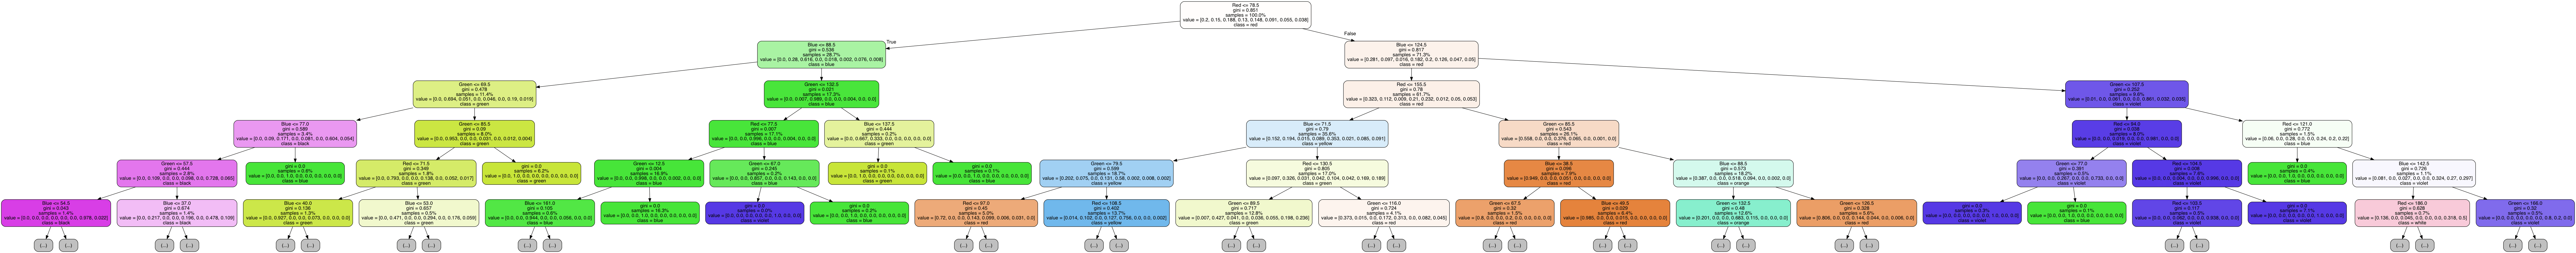 https://github.com/neuropacabra/ColorRecognizer/blob/doc/color_model_graph.png?raw=true